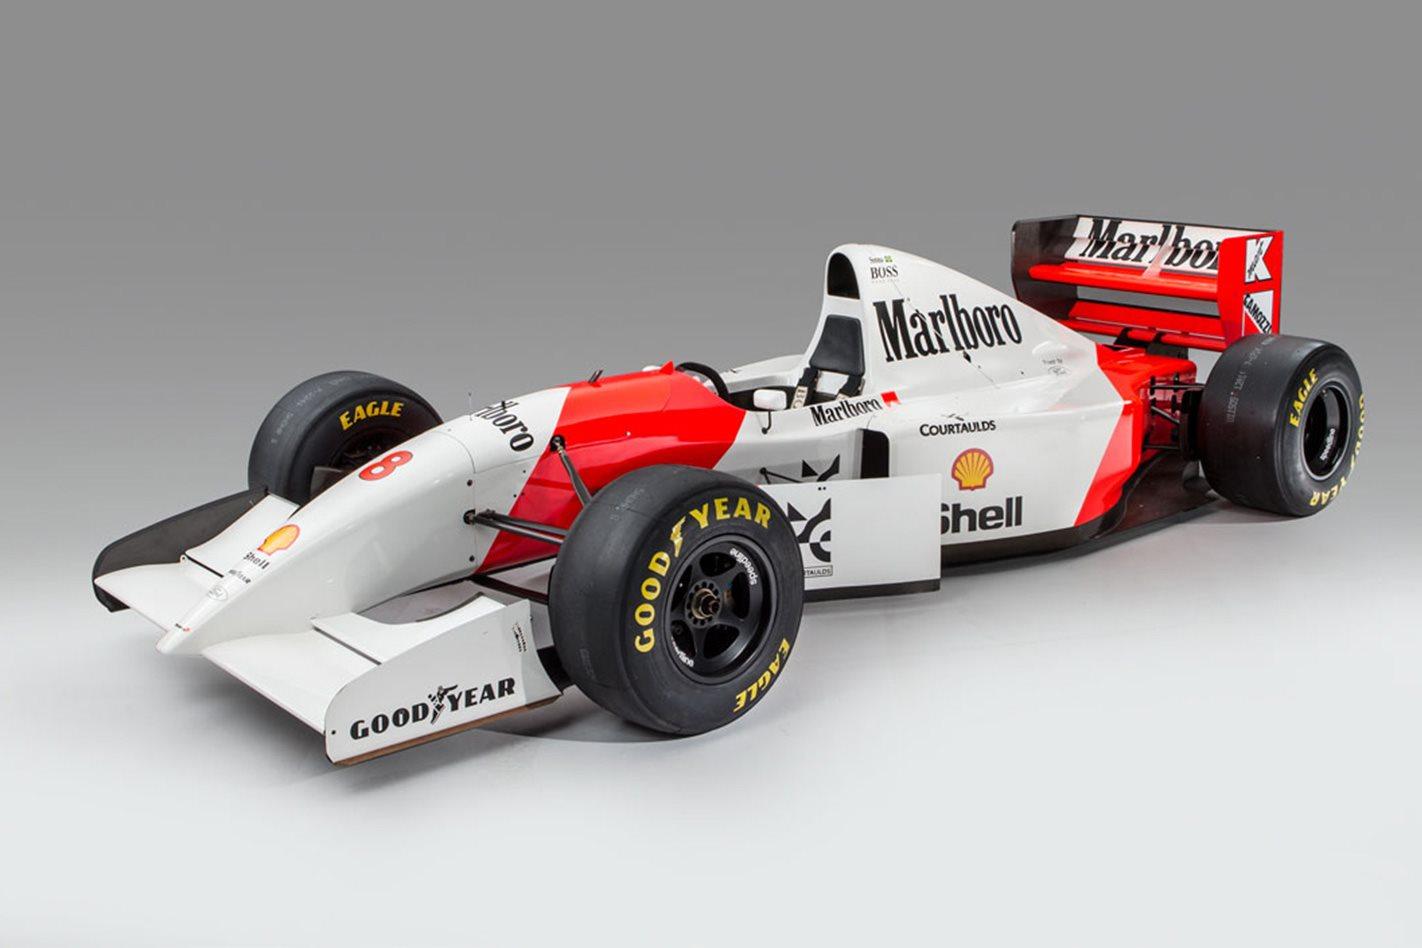 ayrton senna mclaren f1 1993 monaco